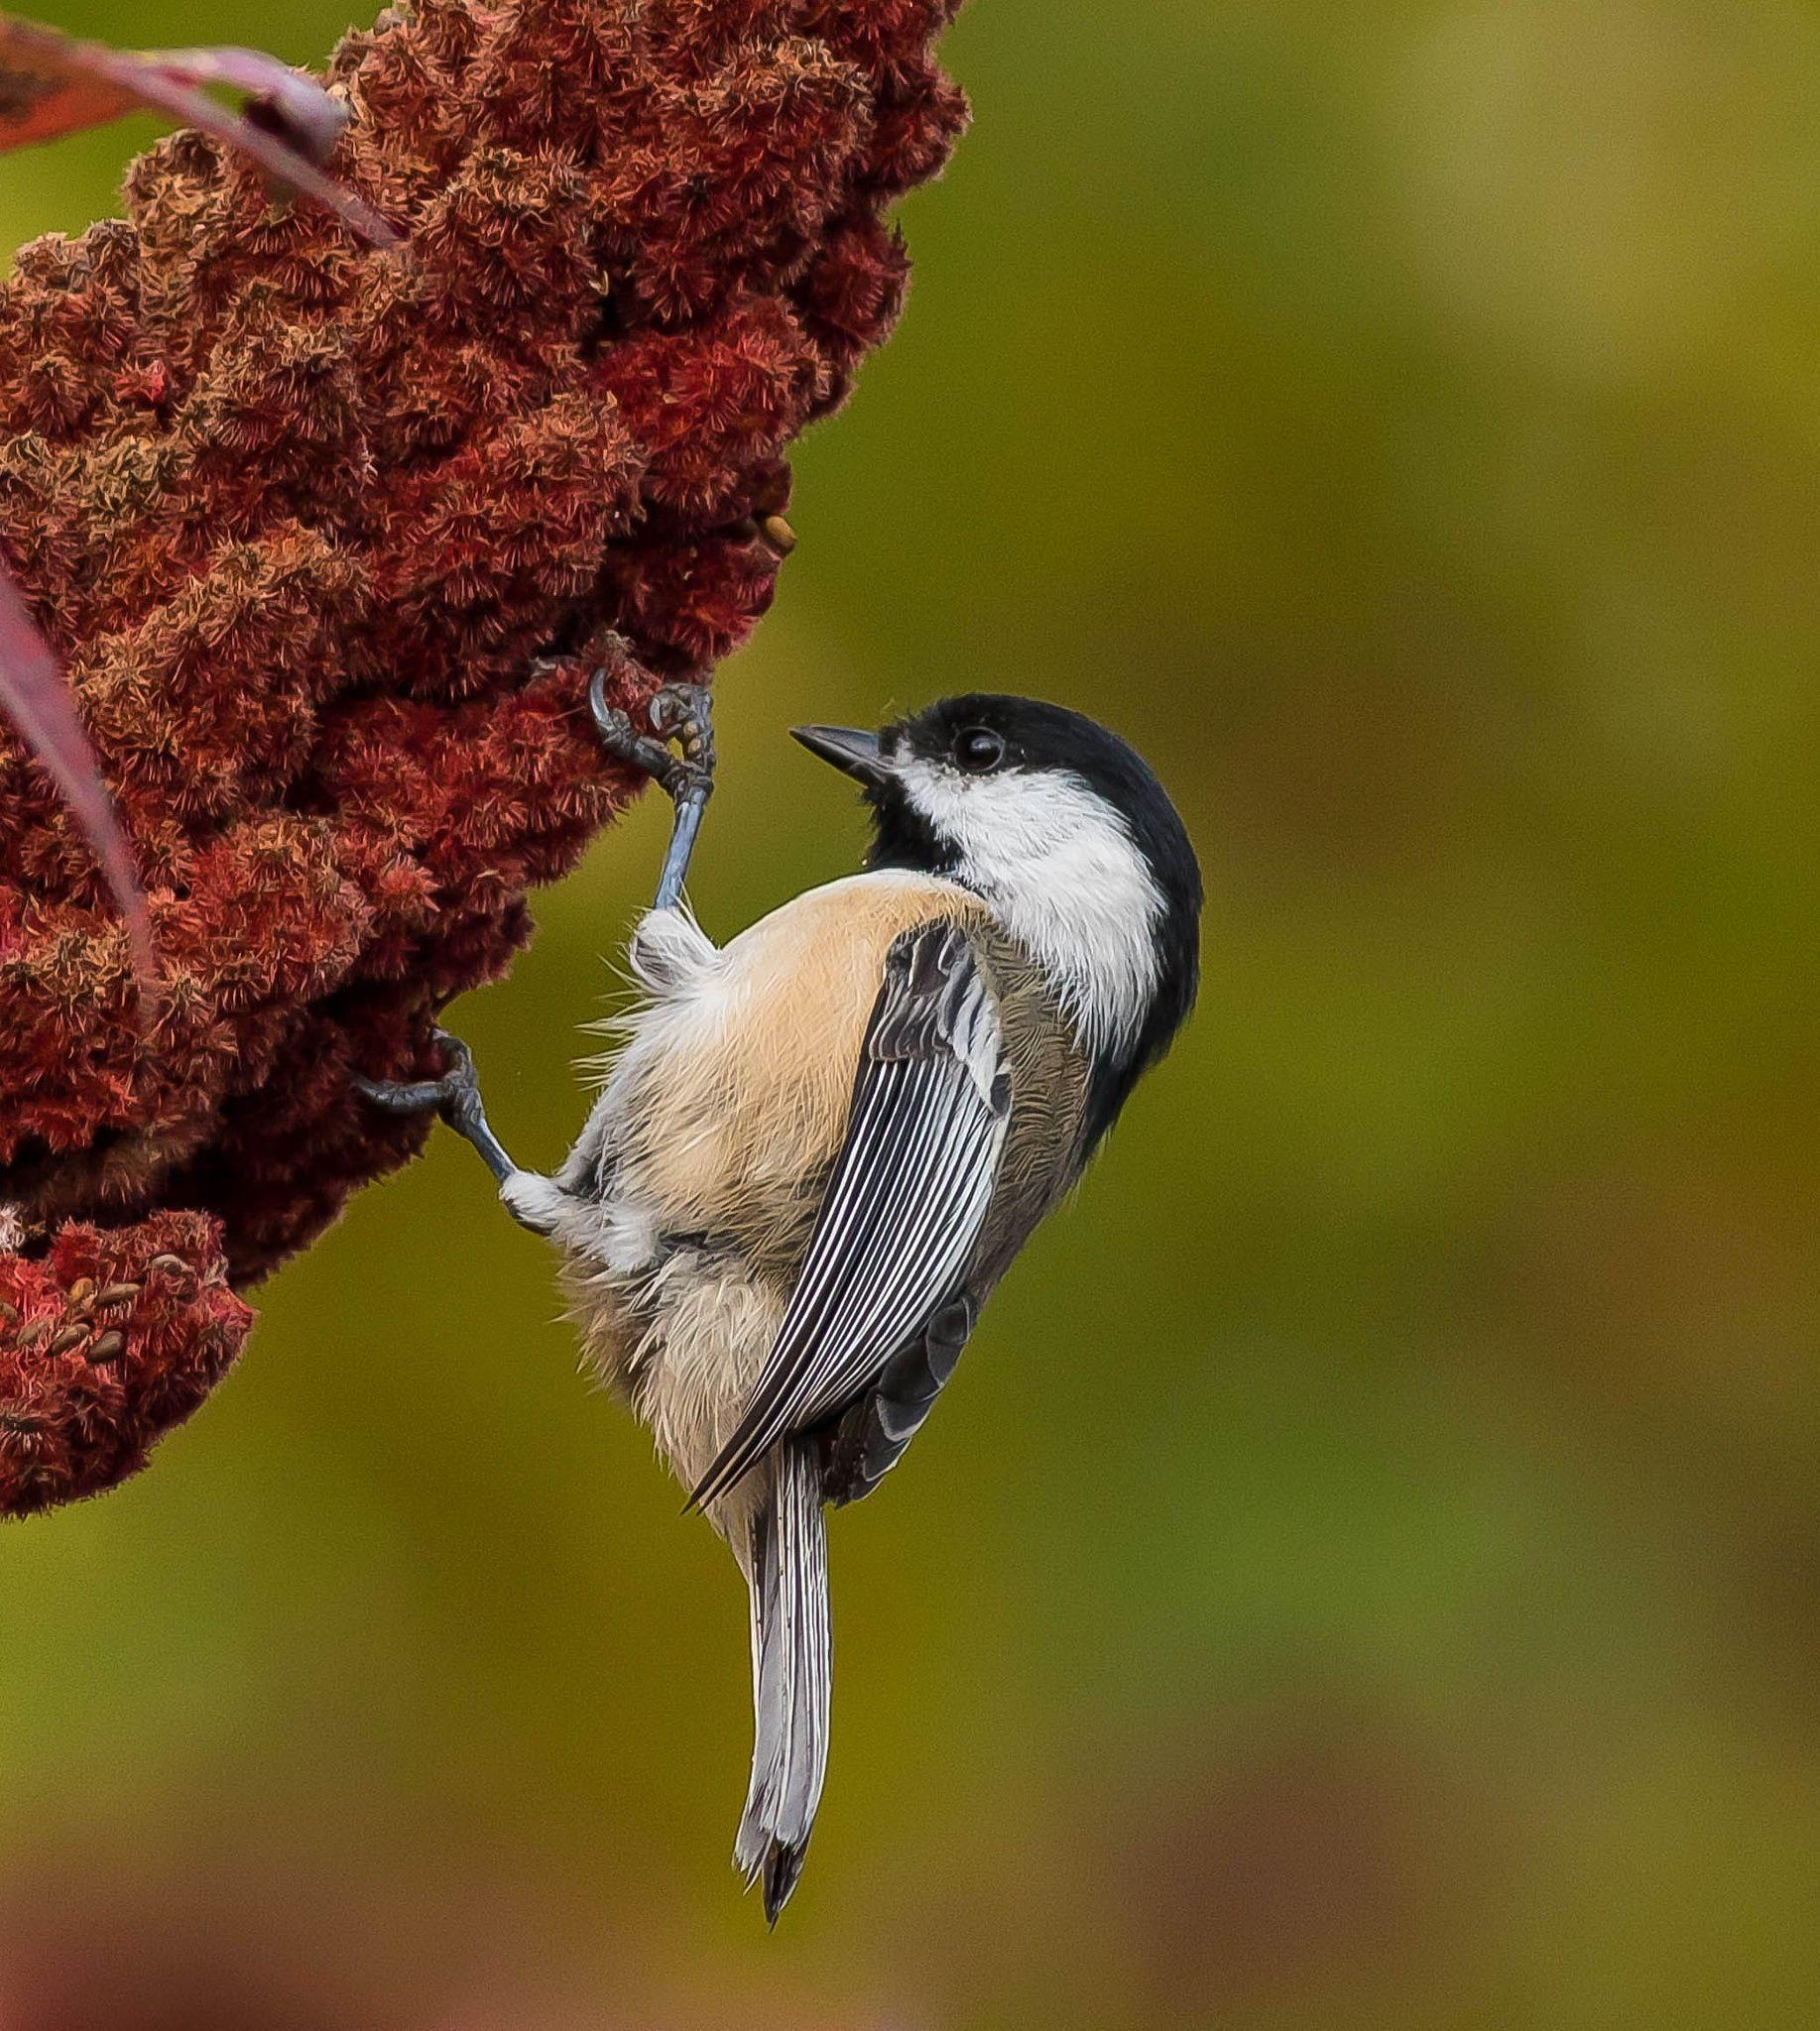 Blackcapped chickadee bird Birds and Blooms Pinterest Pets